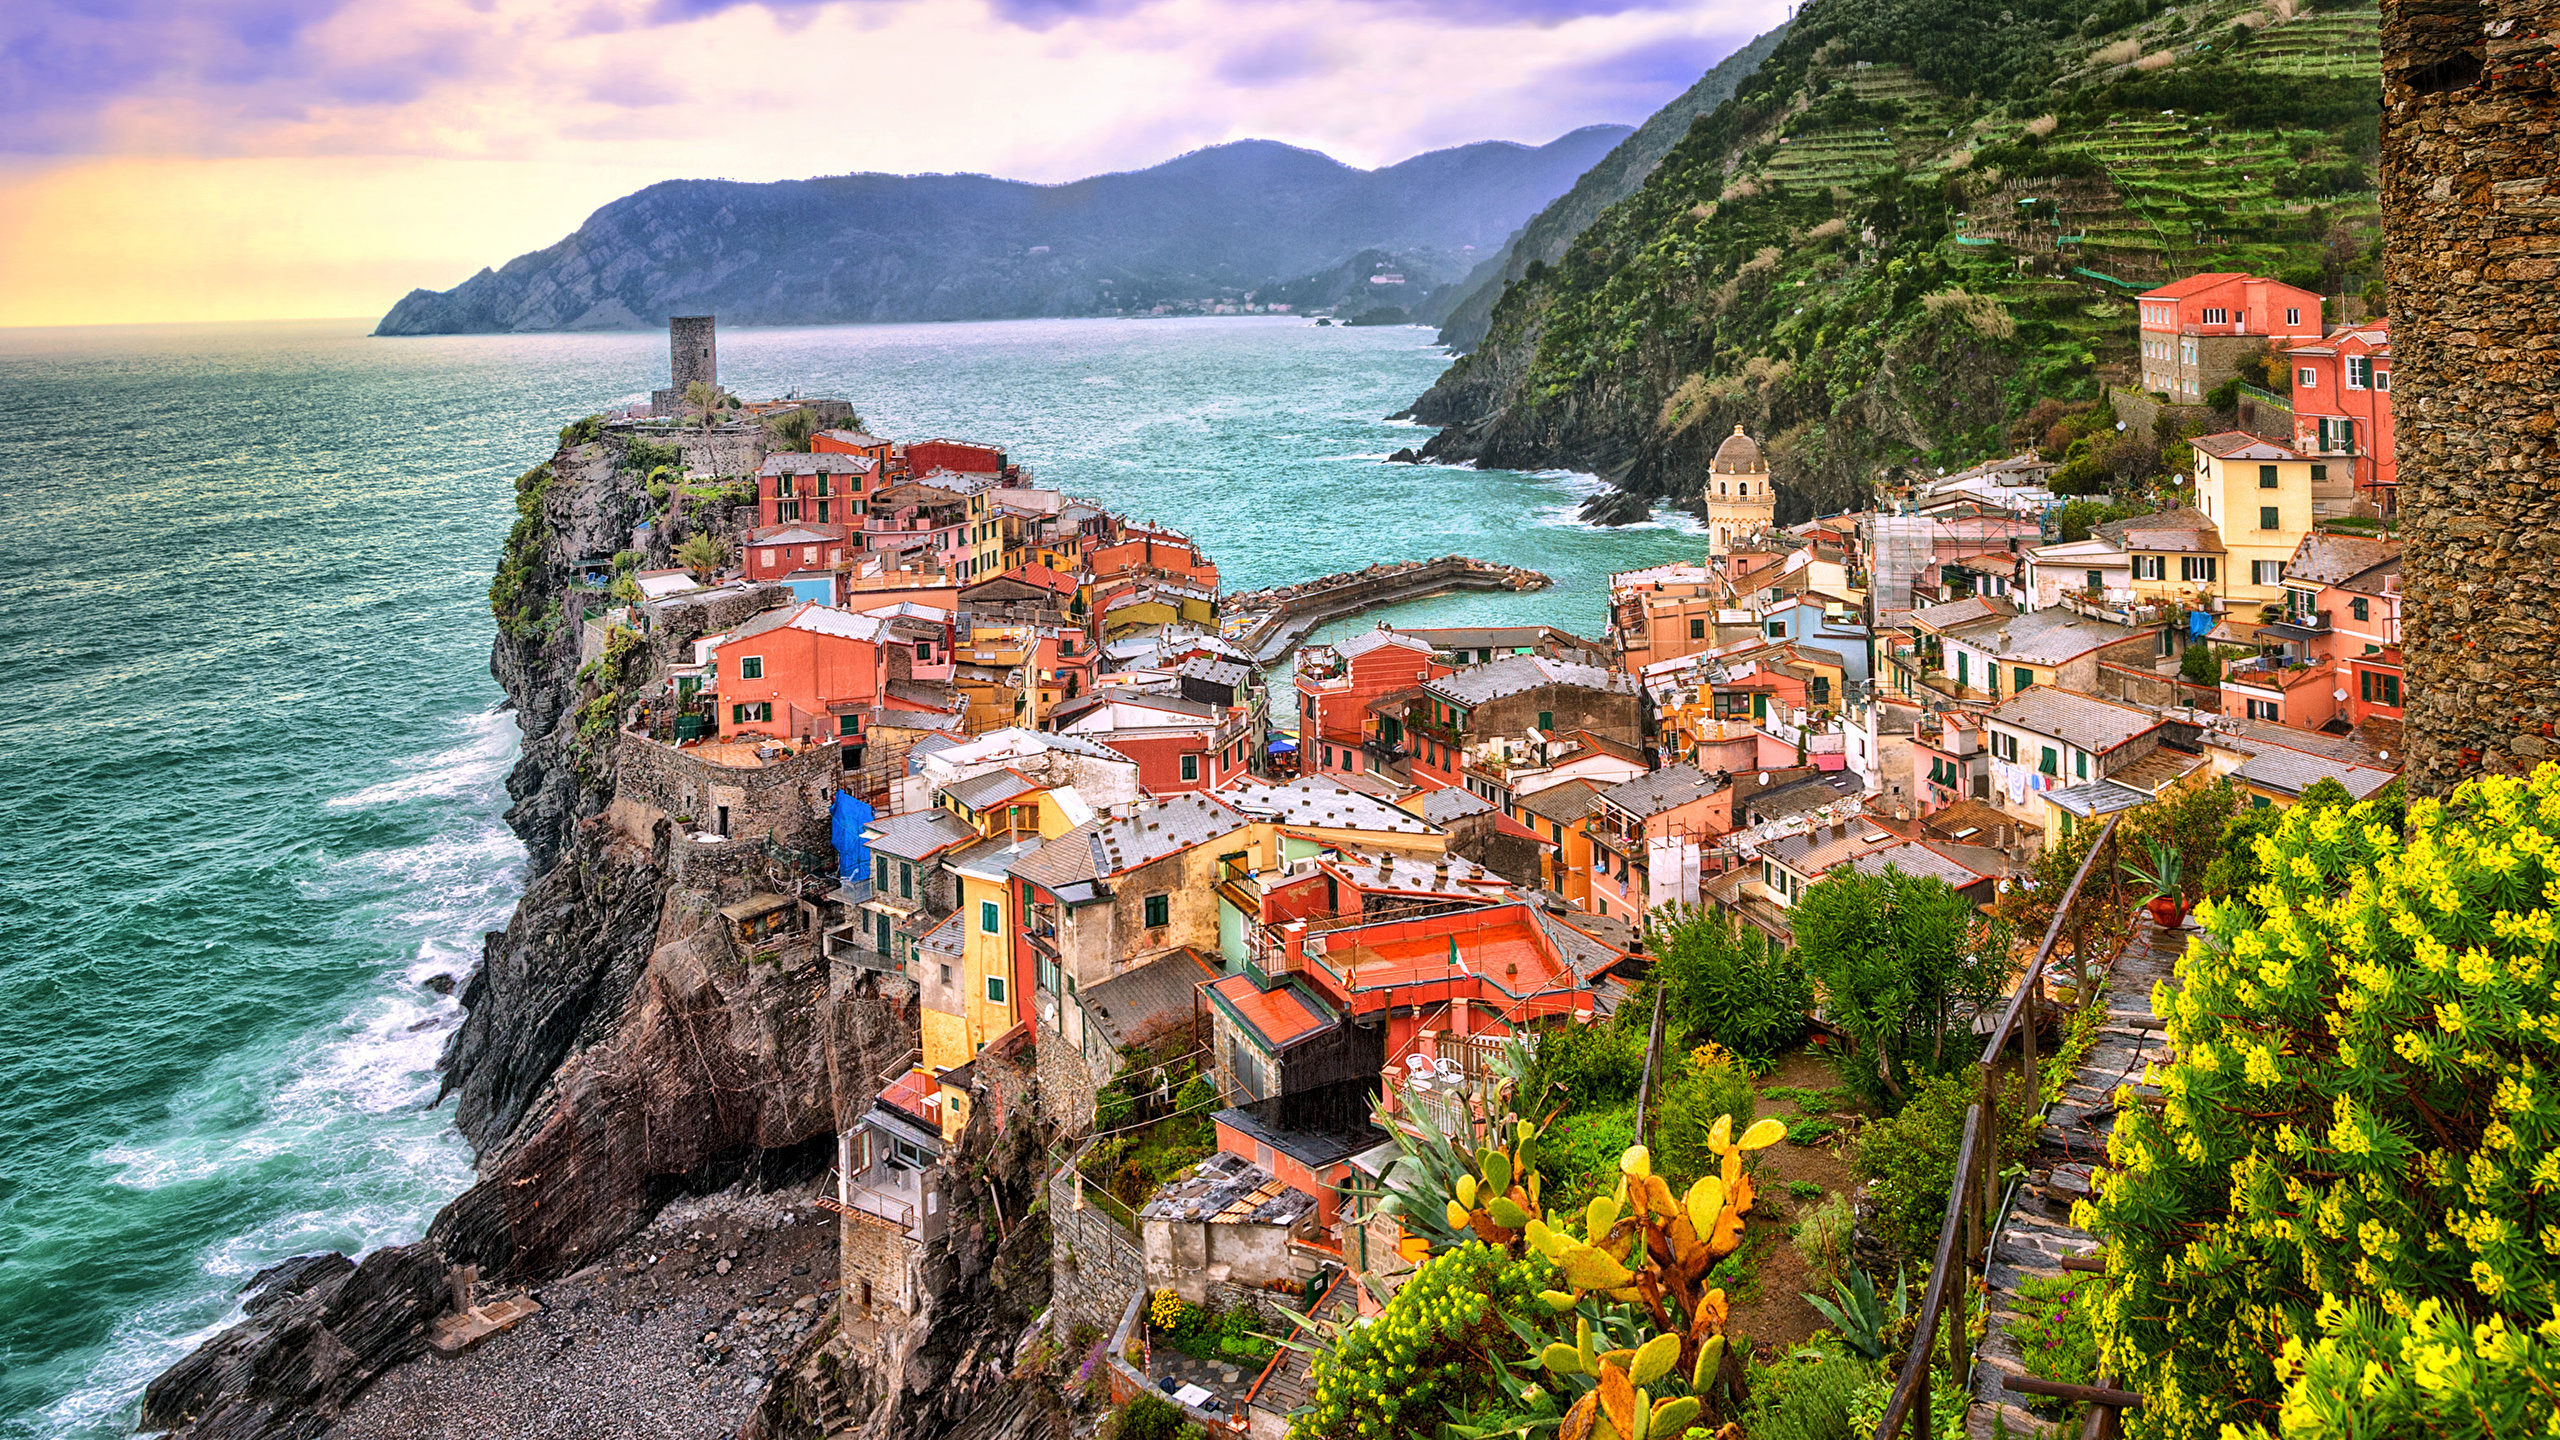 Image Liguria Vernazza Cinque Terre park Italy Cliff Bay 2560x1440 2560x1440